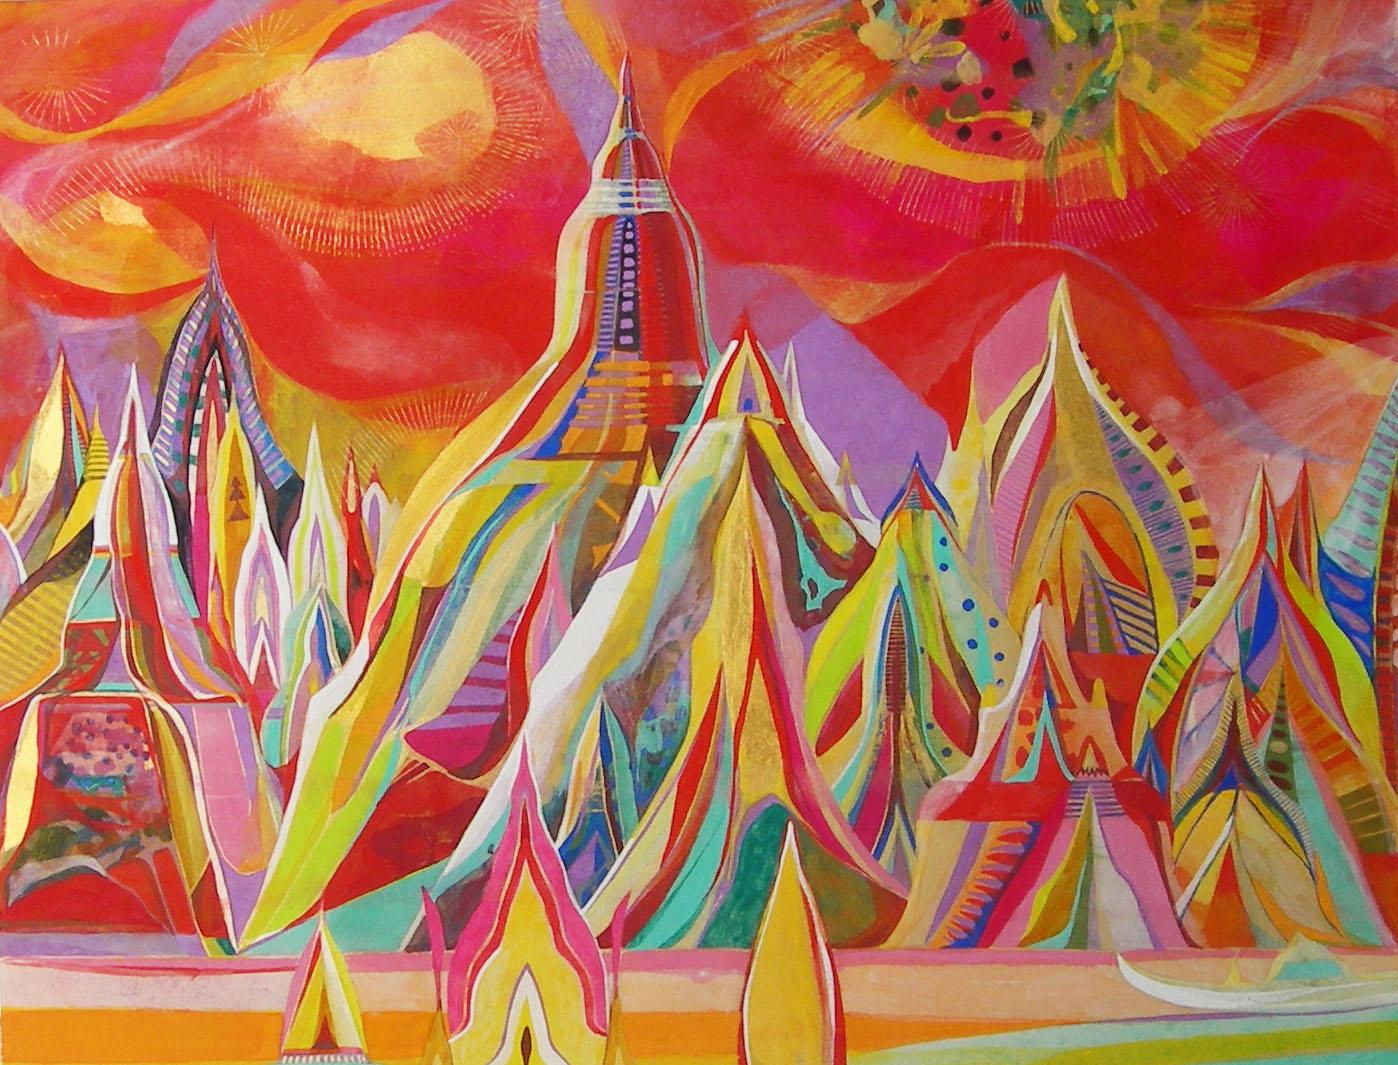 Goldenpagoda